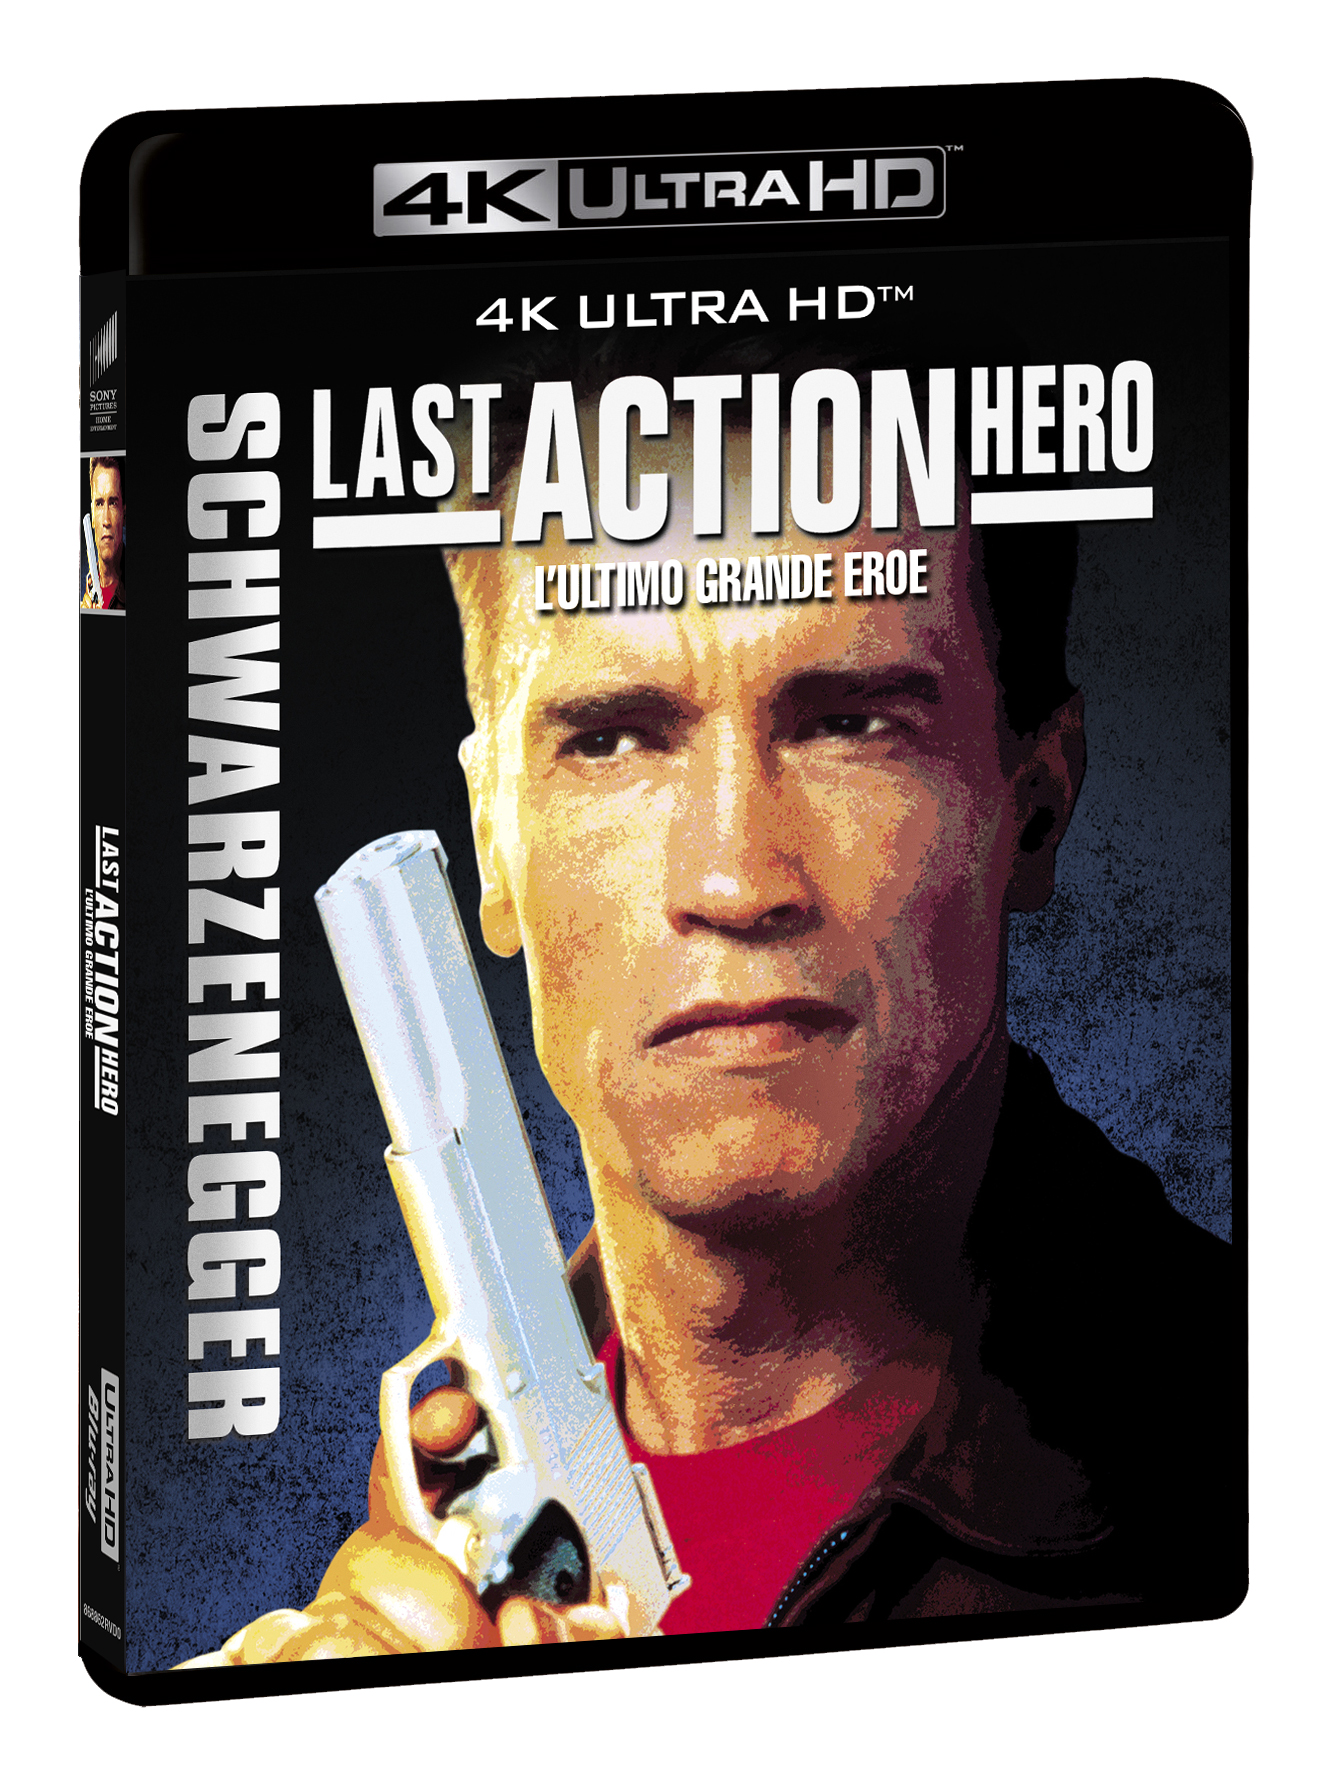 LAST ACTION HERO (BLU-RAY 4K UHD)